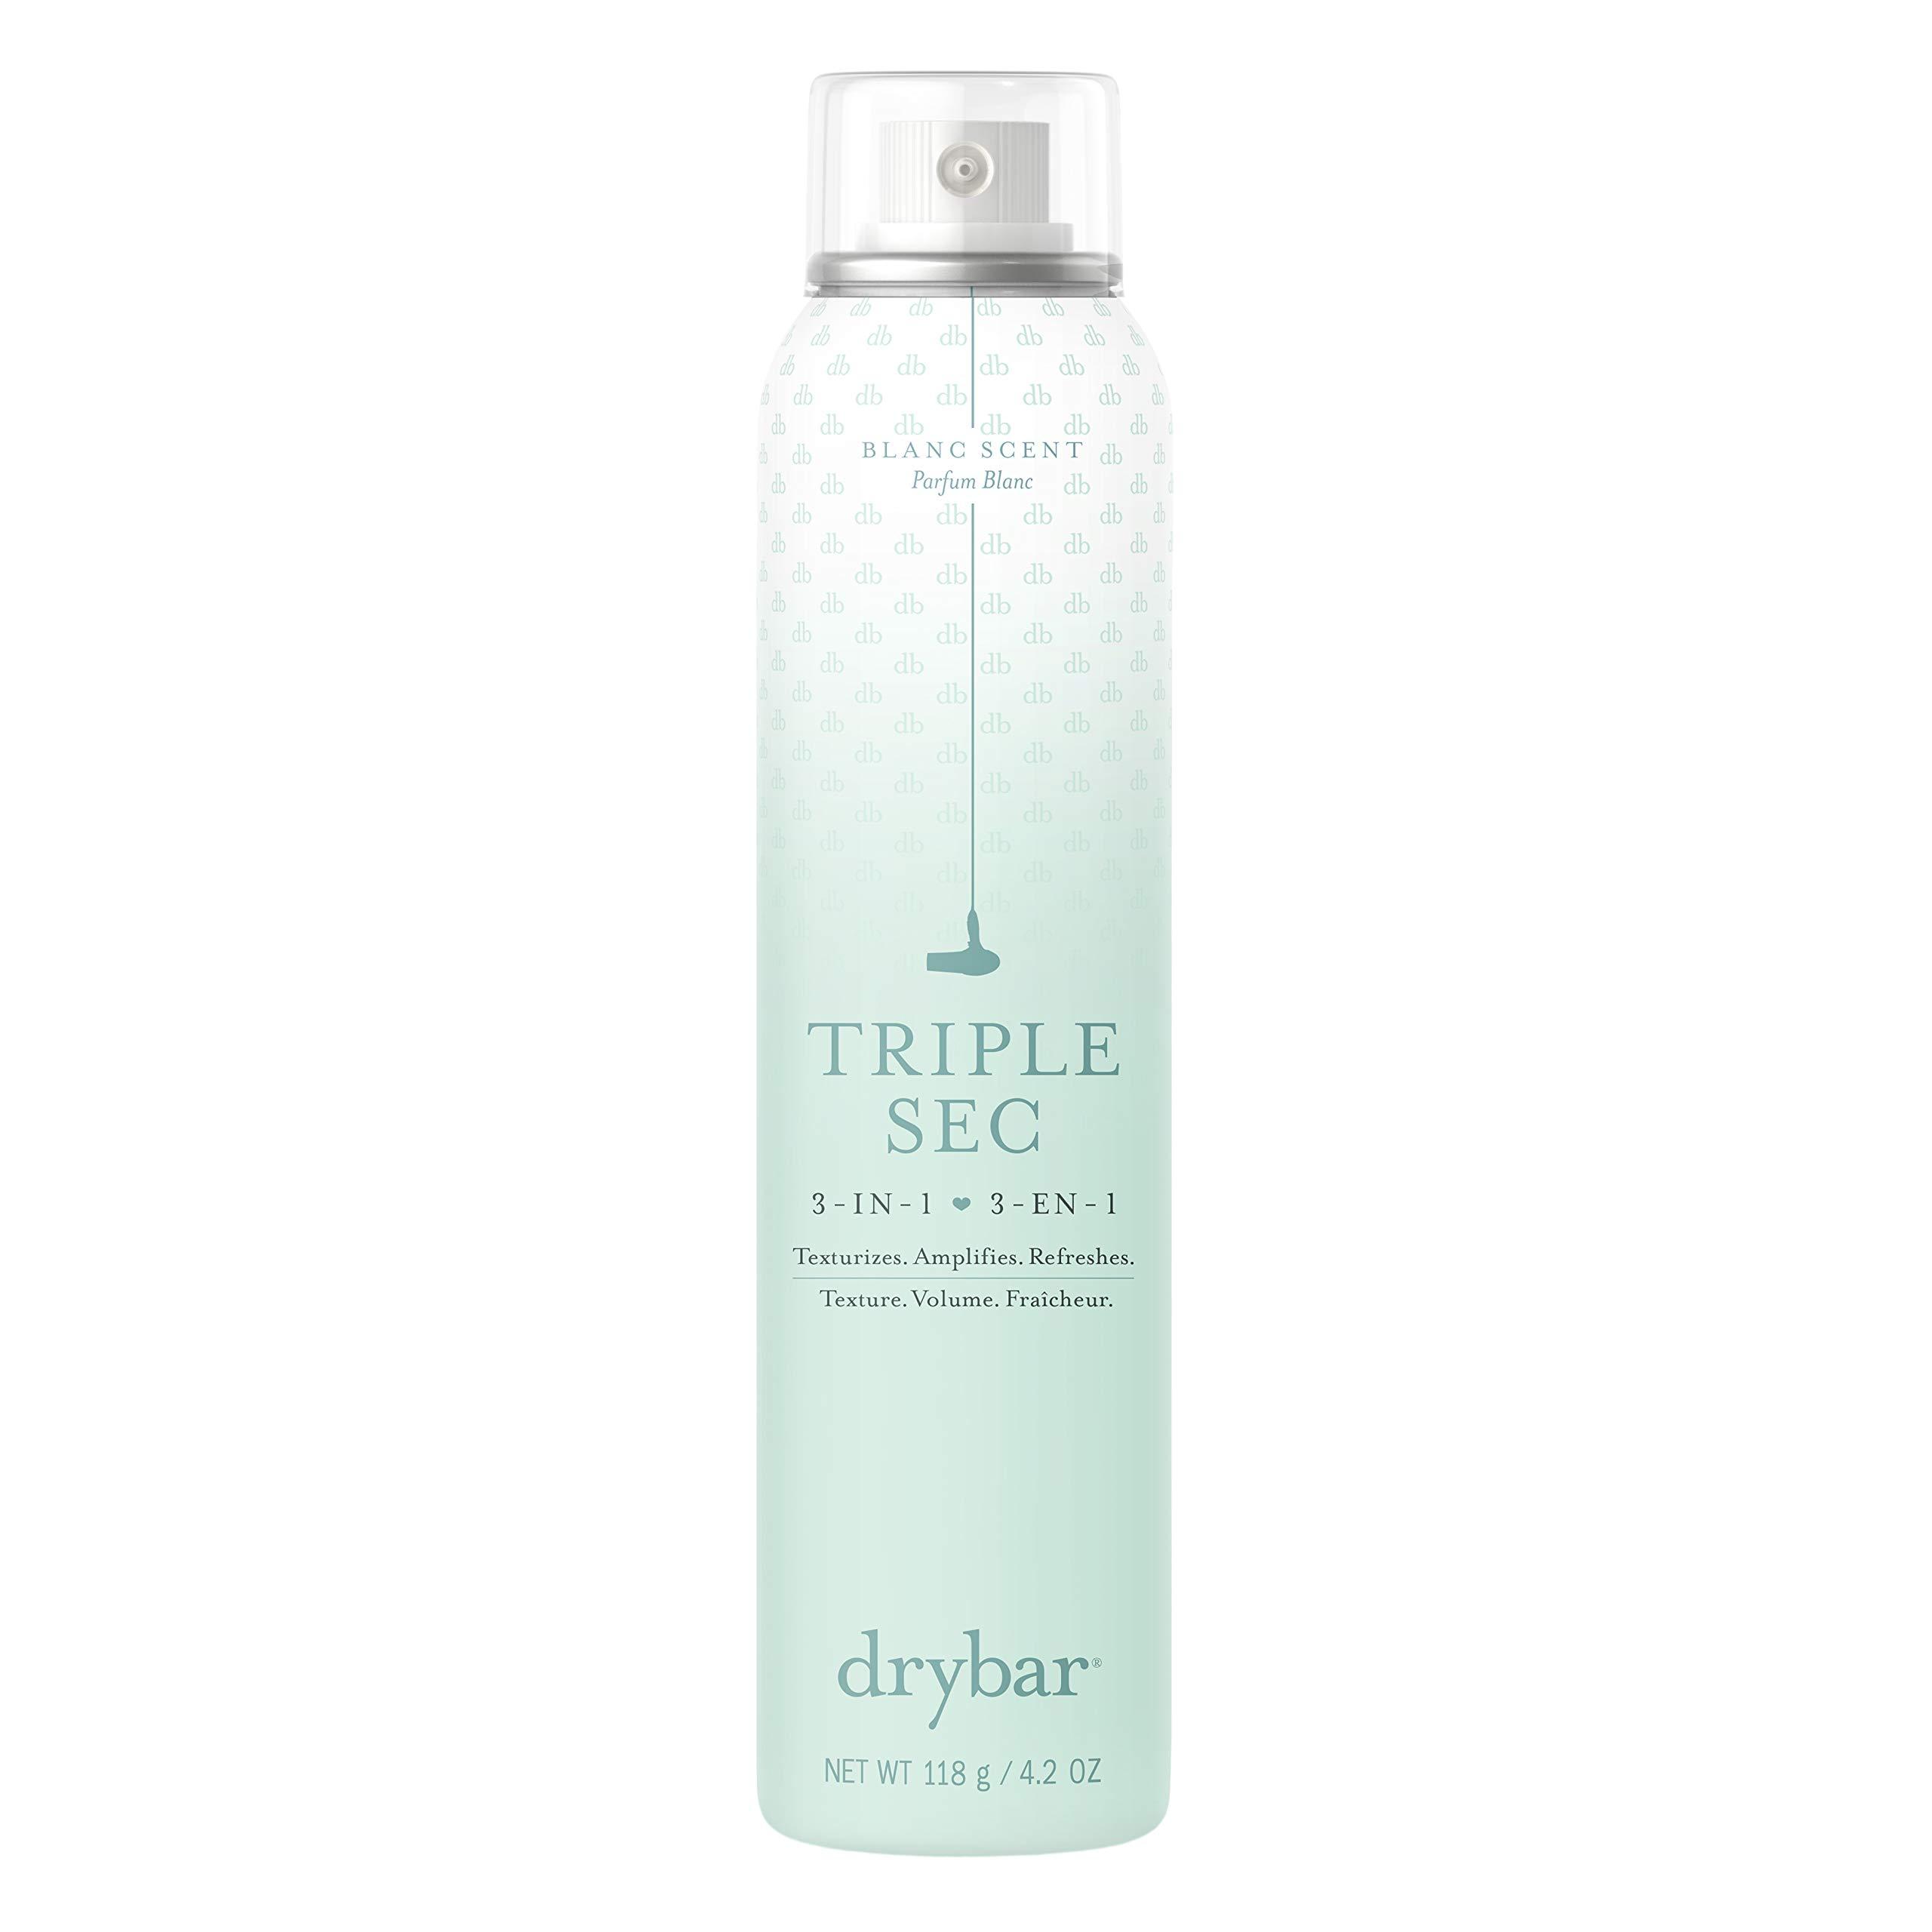 Drybar Triple Sec 3-in-1 Finishing Spray (Blanc Scent) 4.2 ounces